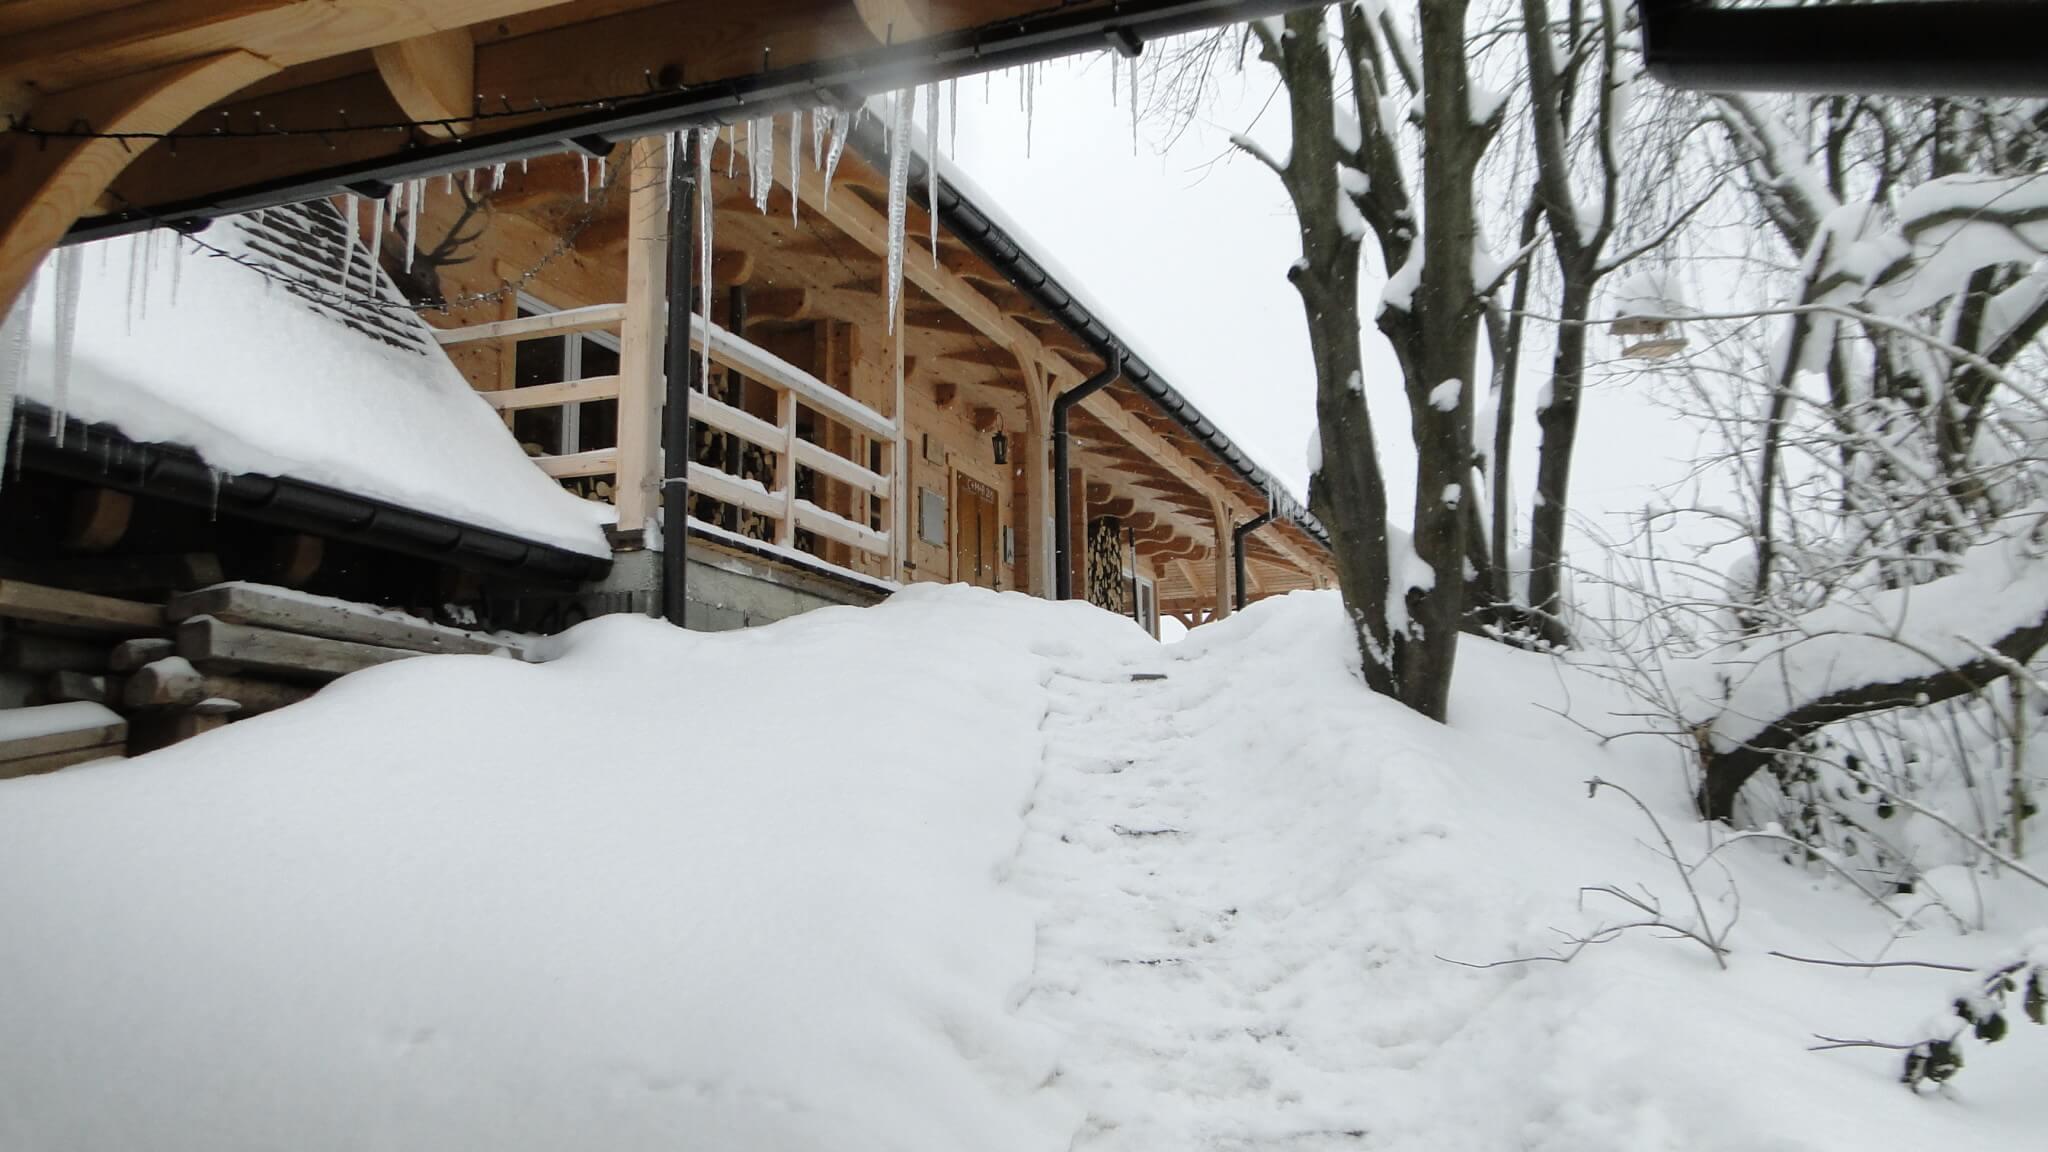 Śnieg,  śnieg, śnieg!... 11